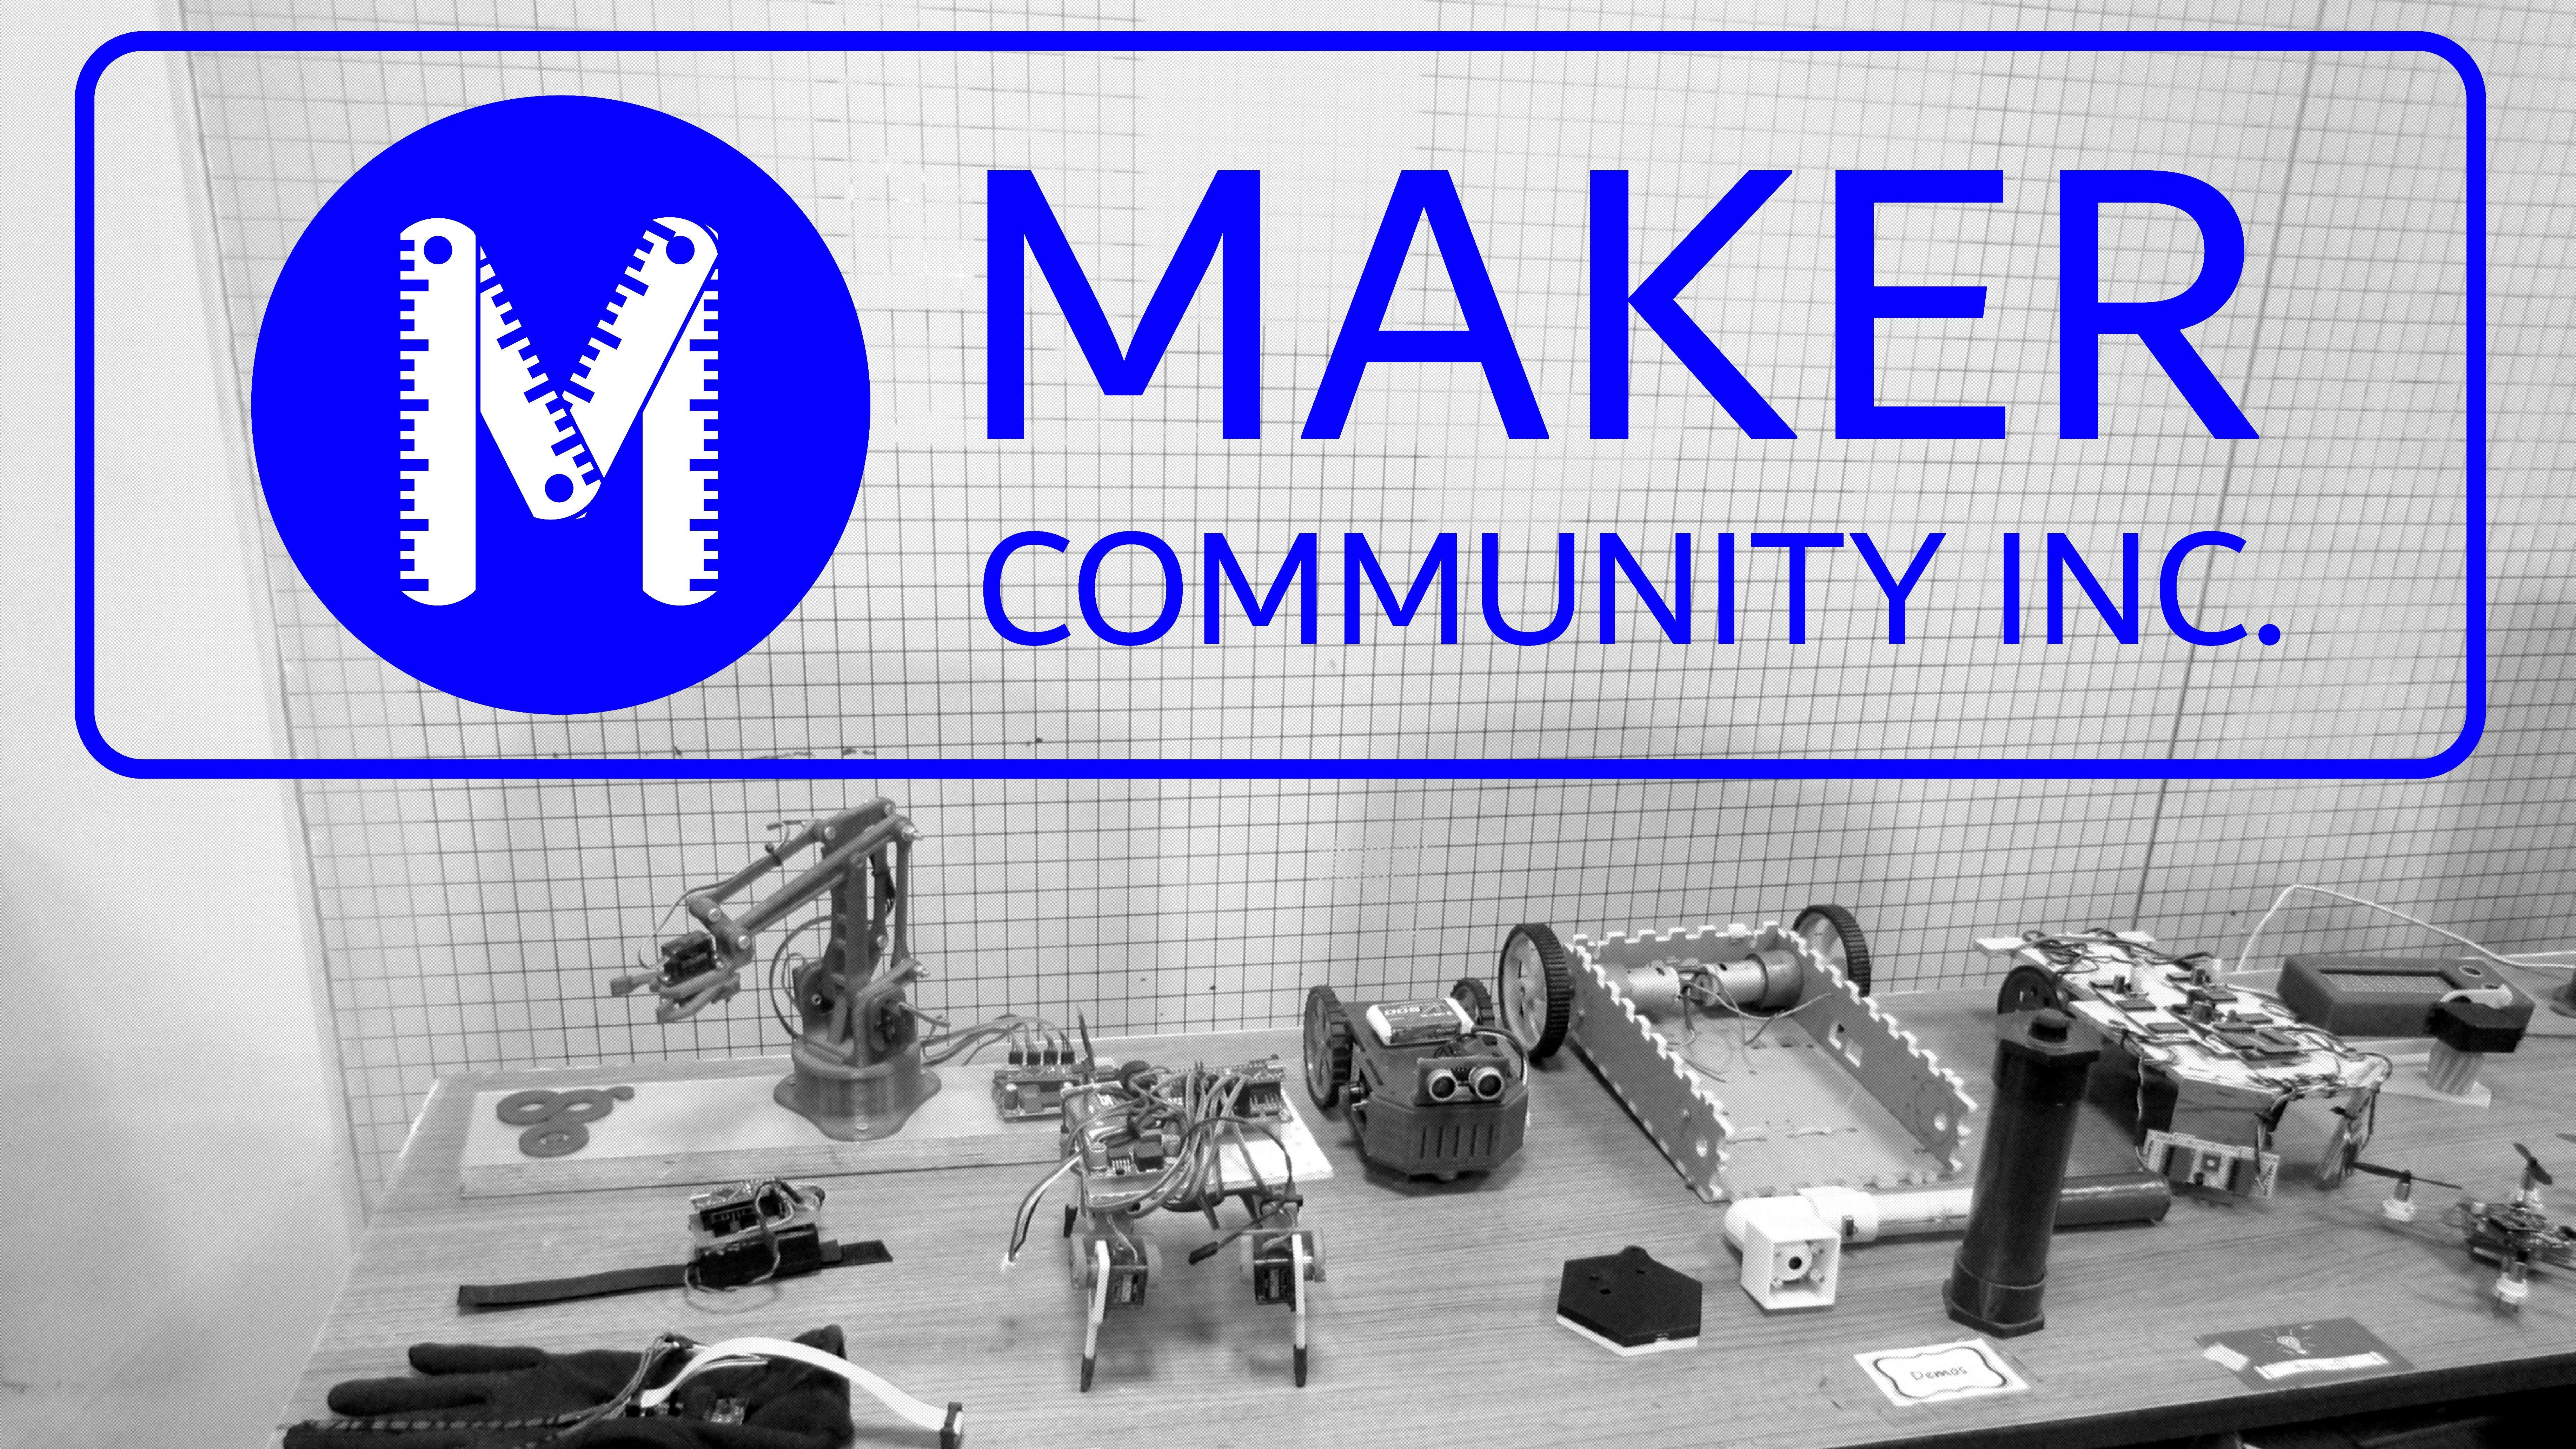 Maker Community Inc